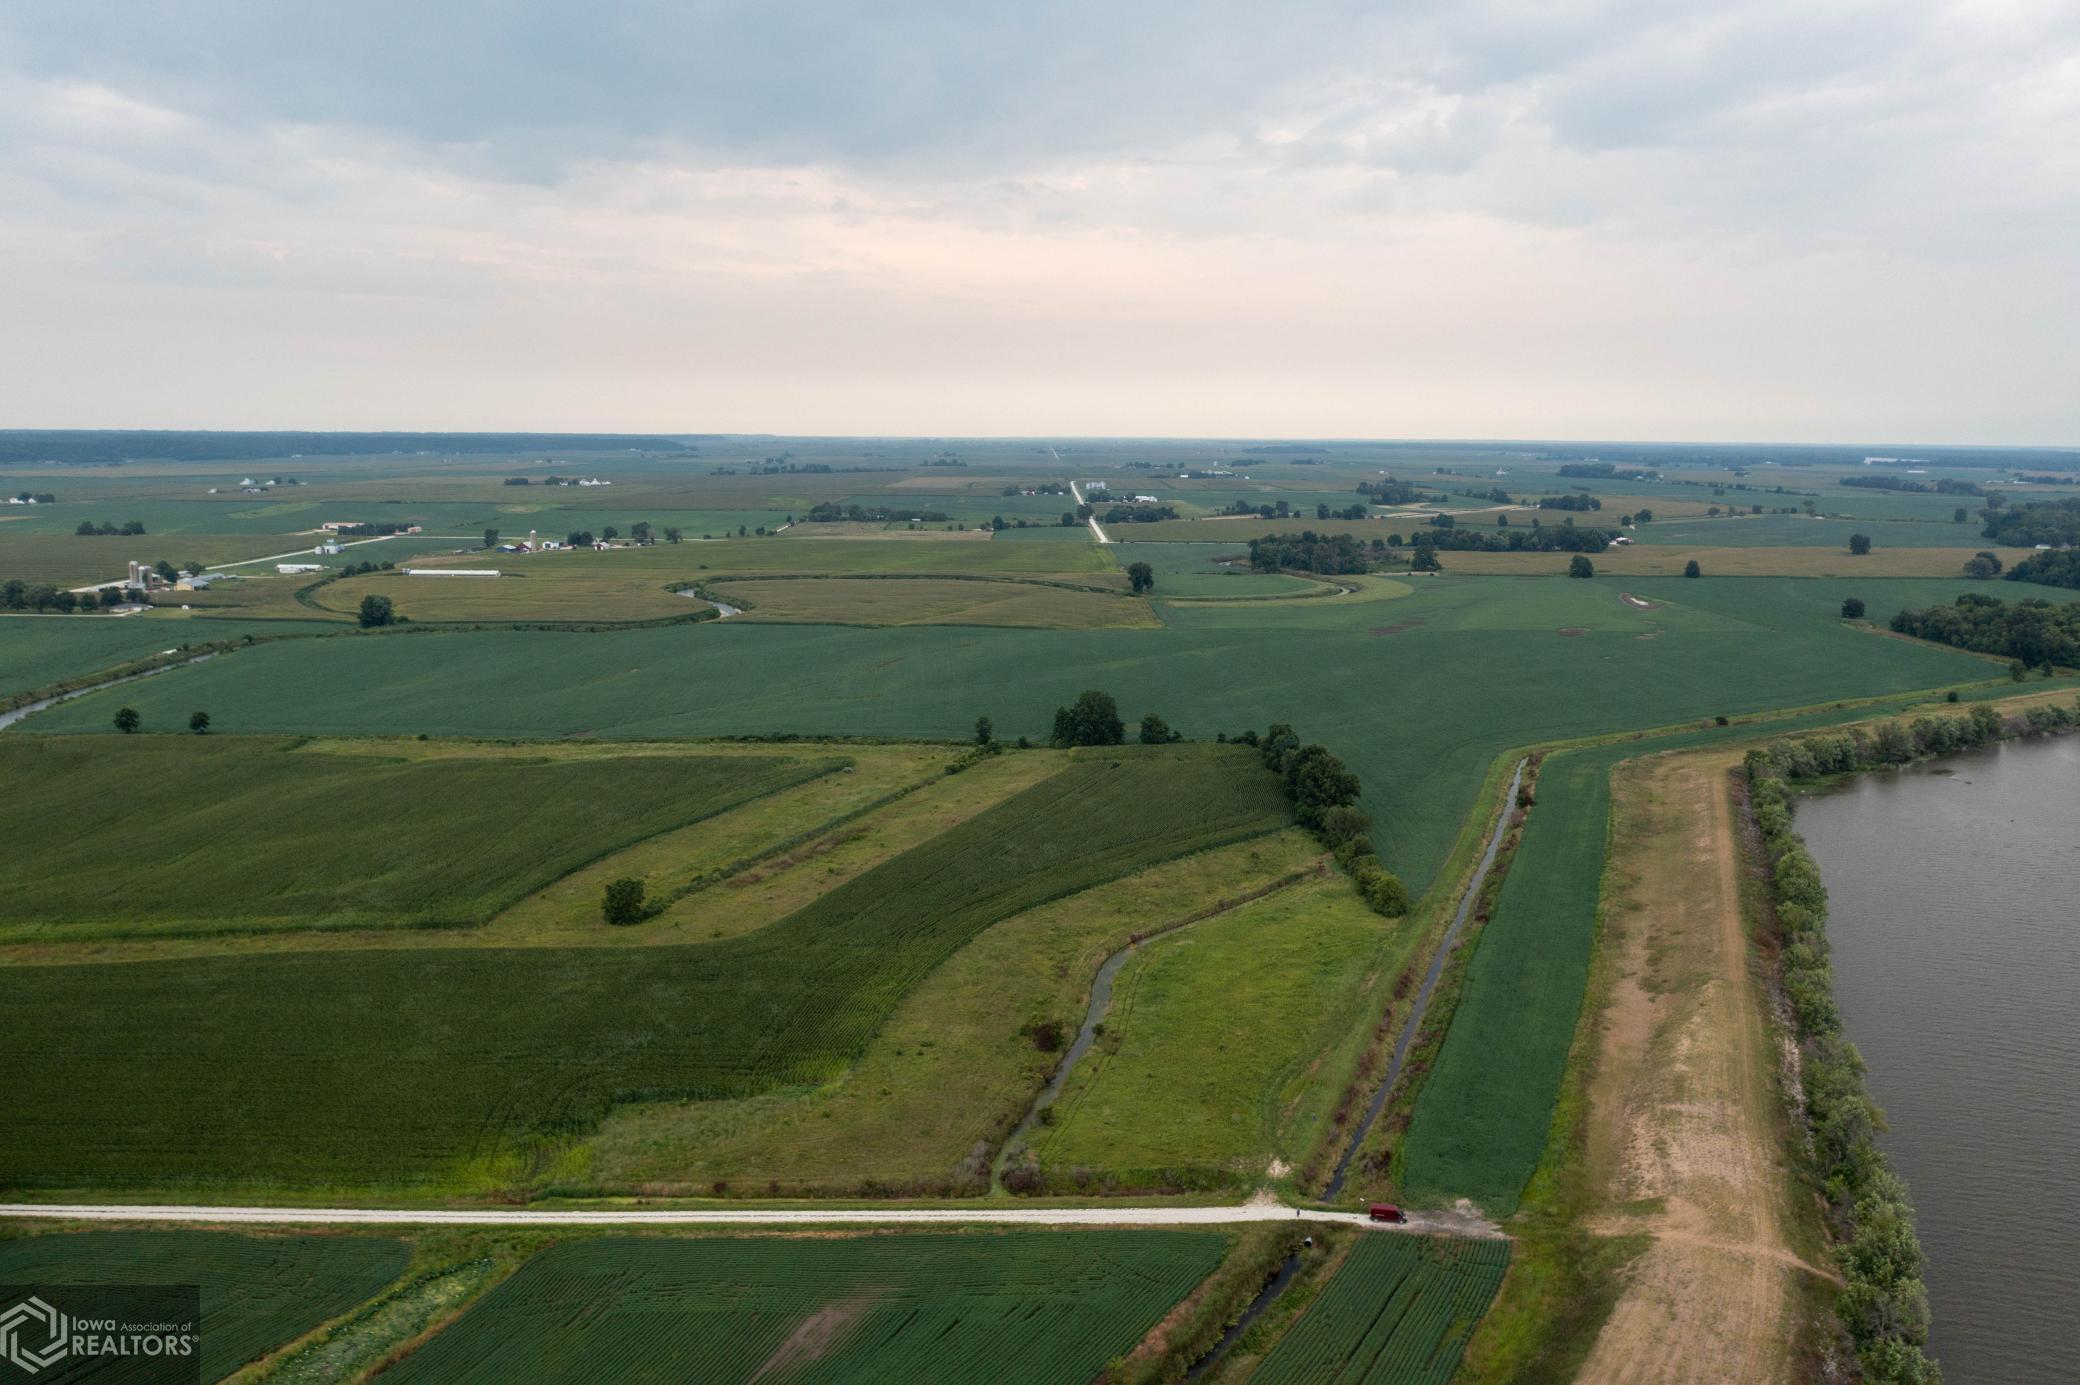 RR5 County Rd, IA